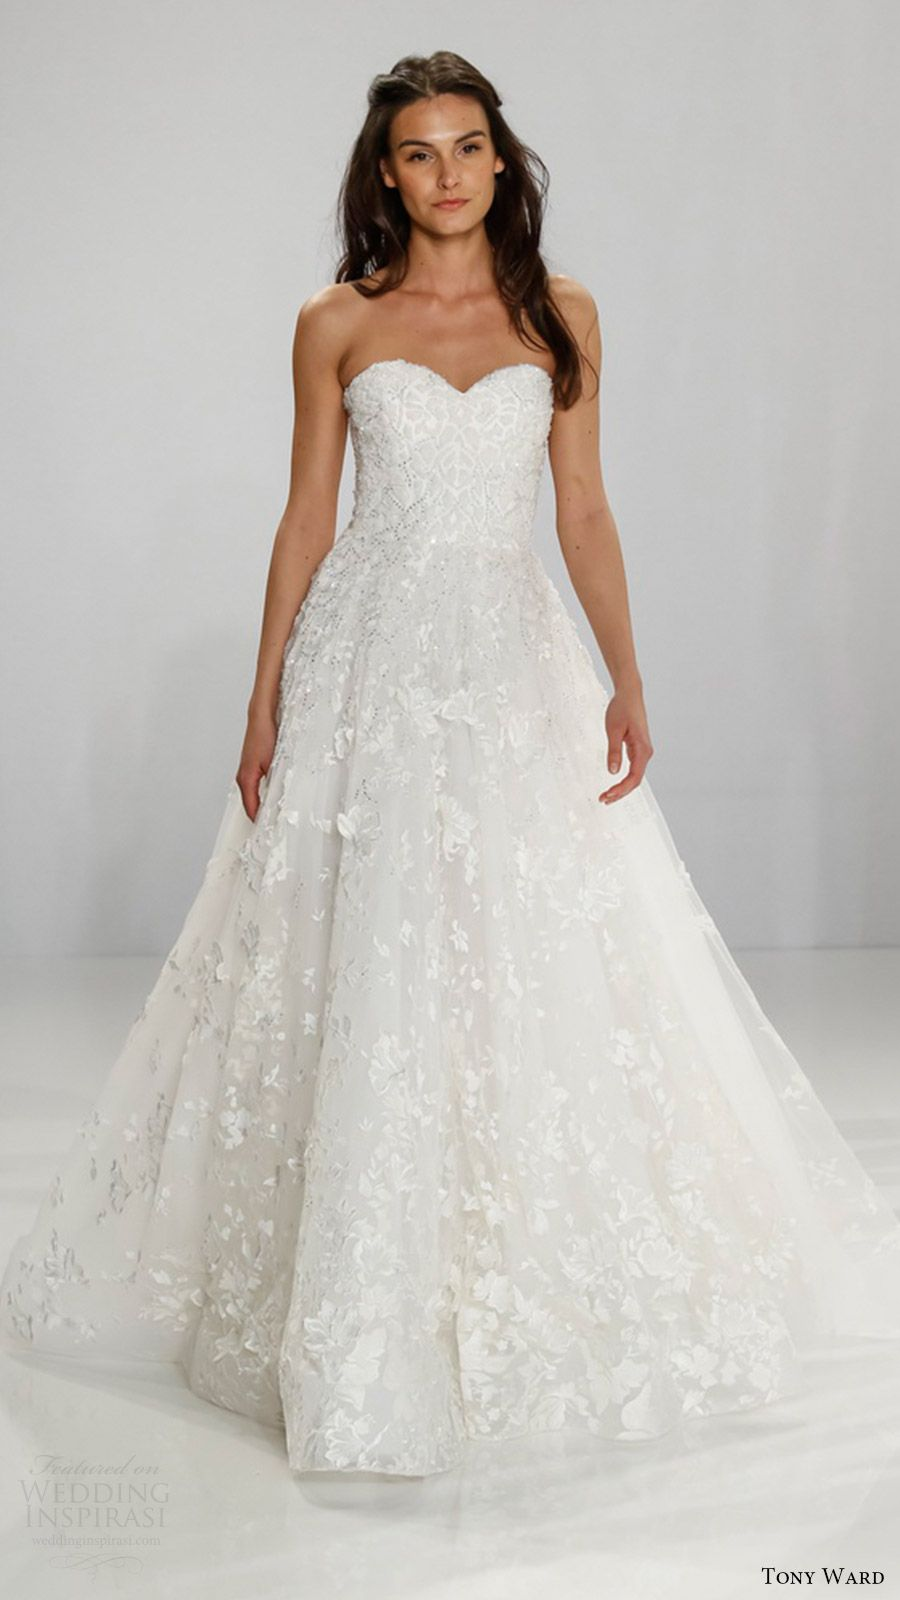 Tony ward bridal wedding dresses tony ward bridal wedding